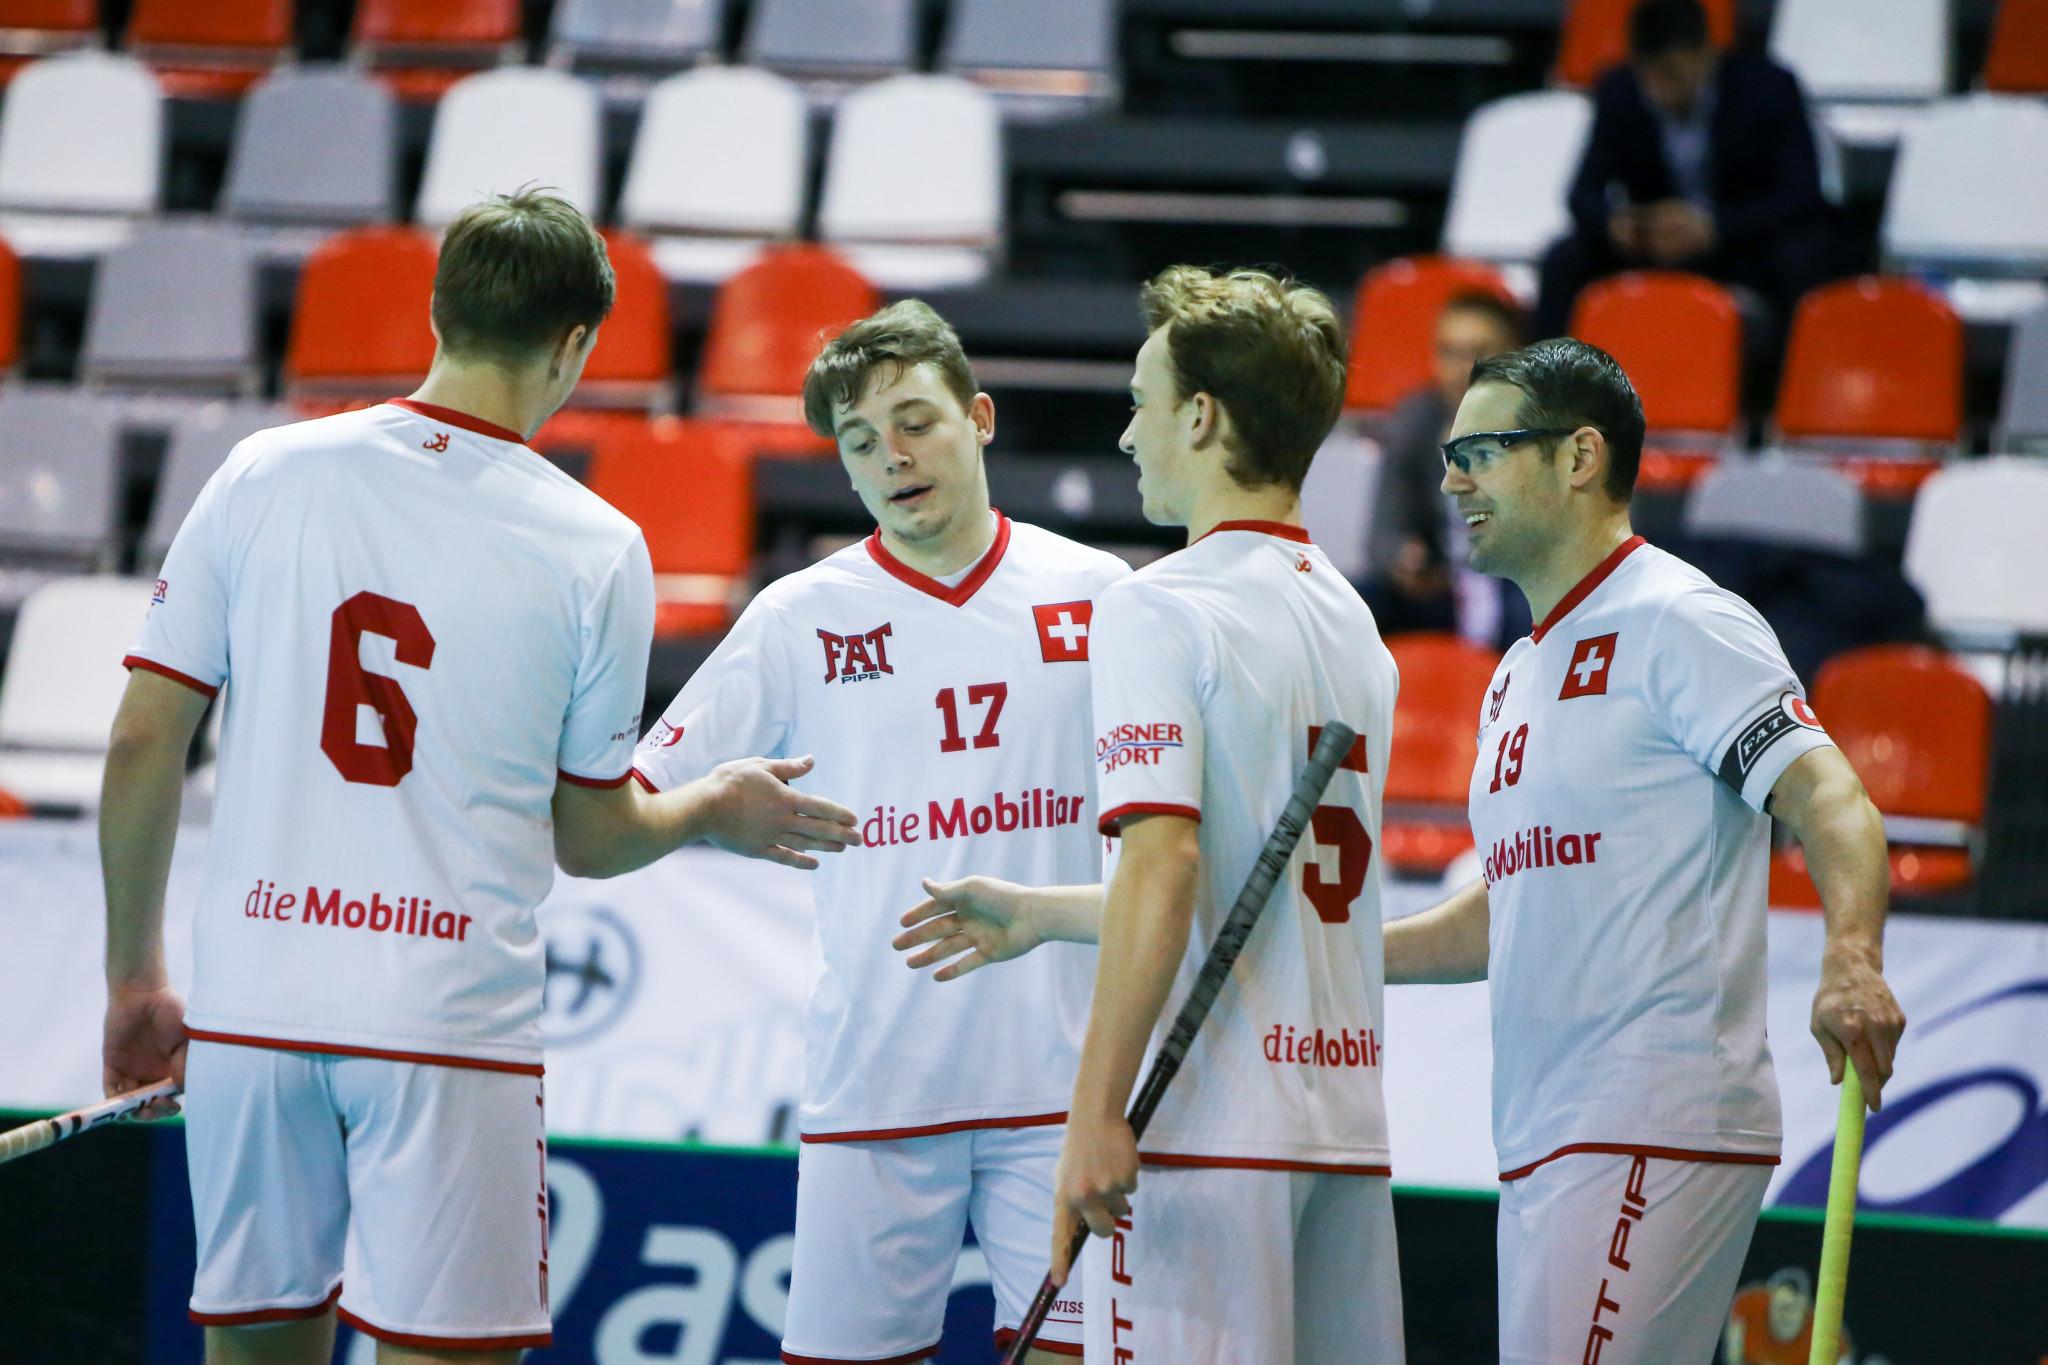 Switzerland thrash Italy on opening day of European qualifier for Men's World Floorball Championships